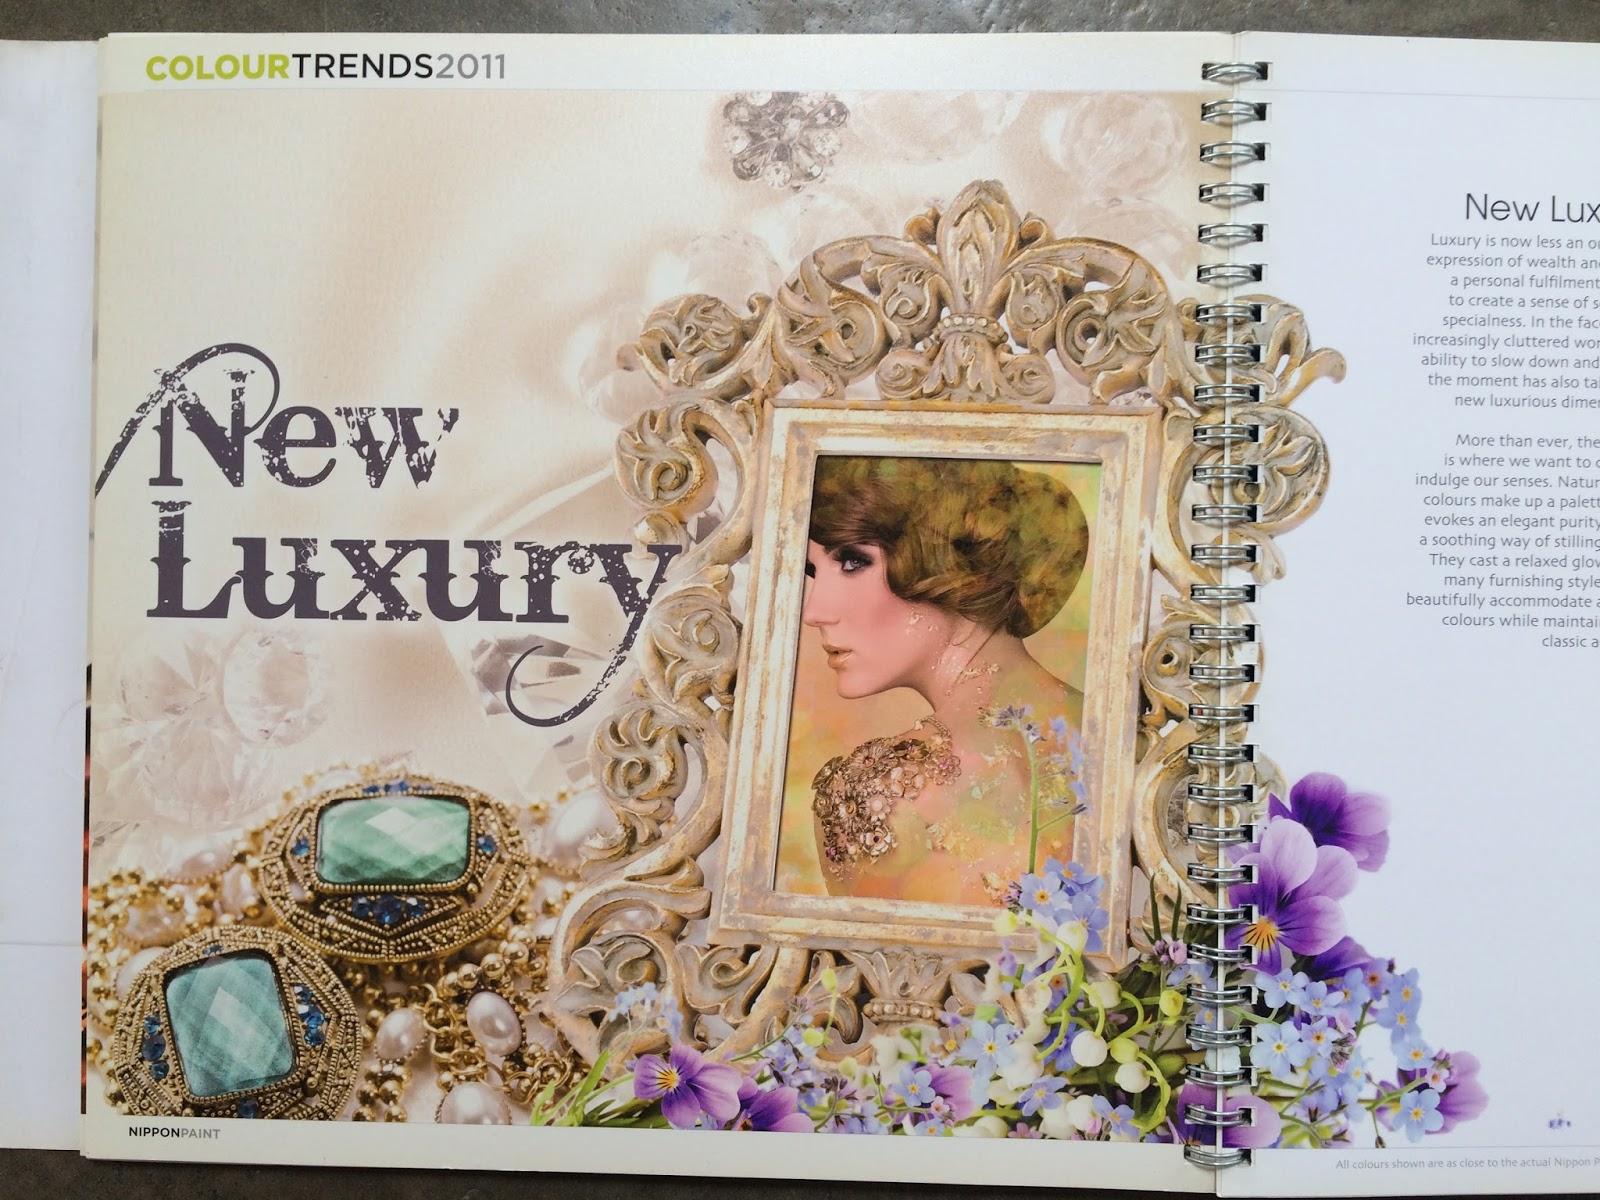 Parse906 Nippon Paint Color Chart 2011 Trend Wallpaper Stiker Dinding Lux 5 23pr